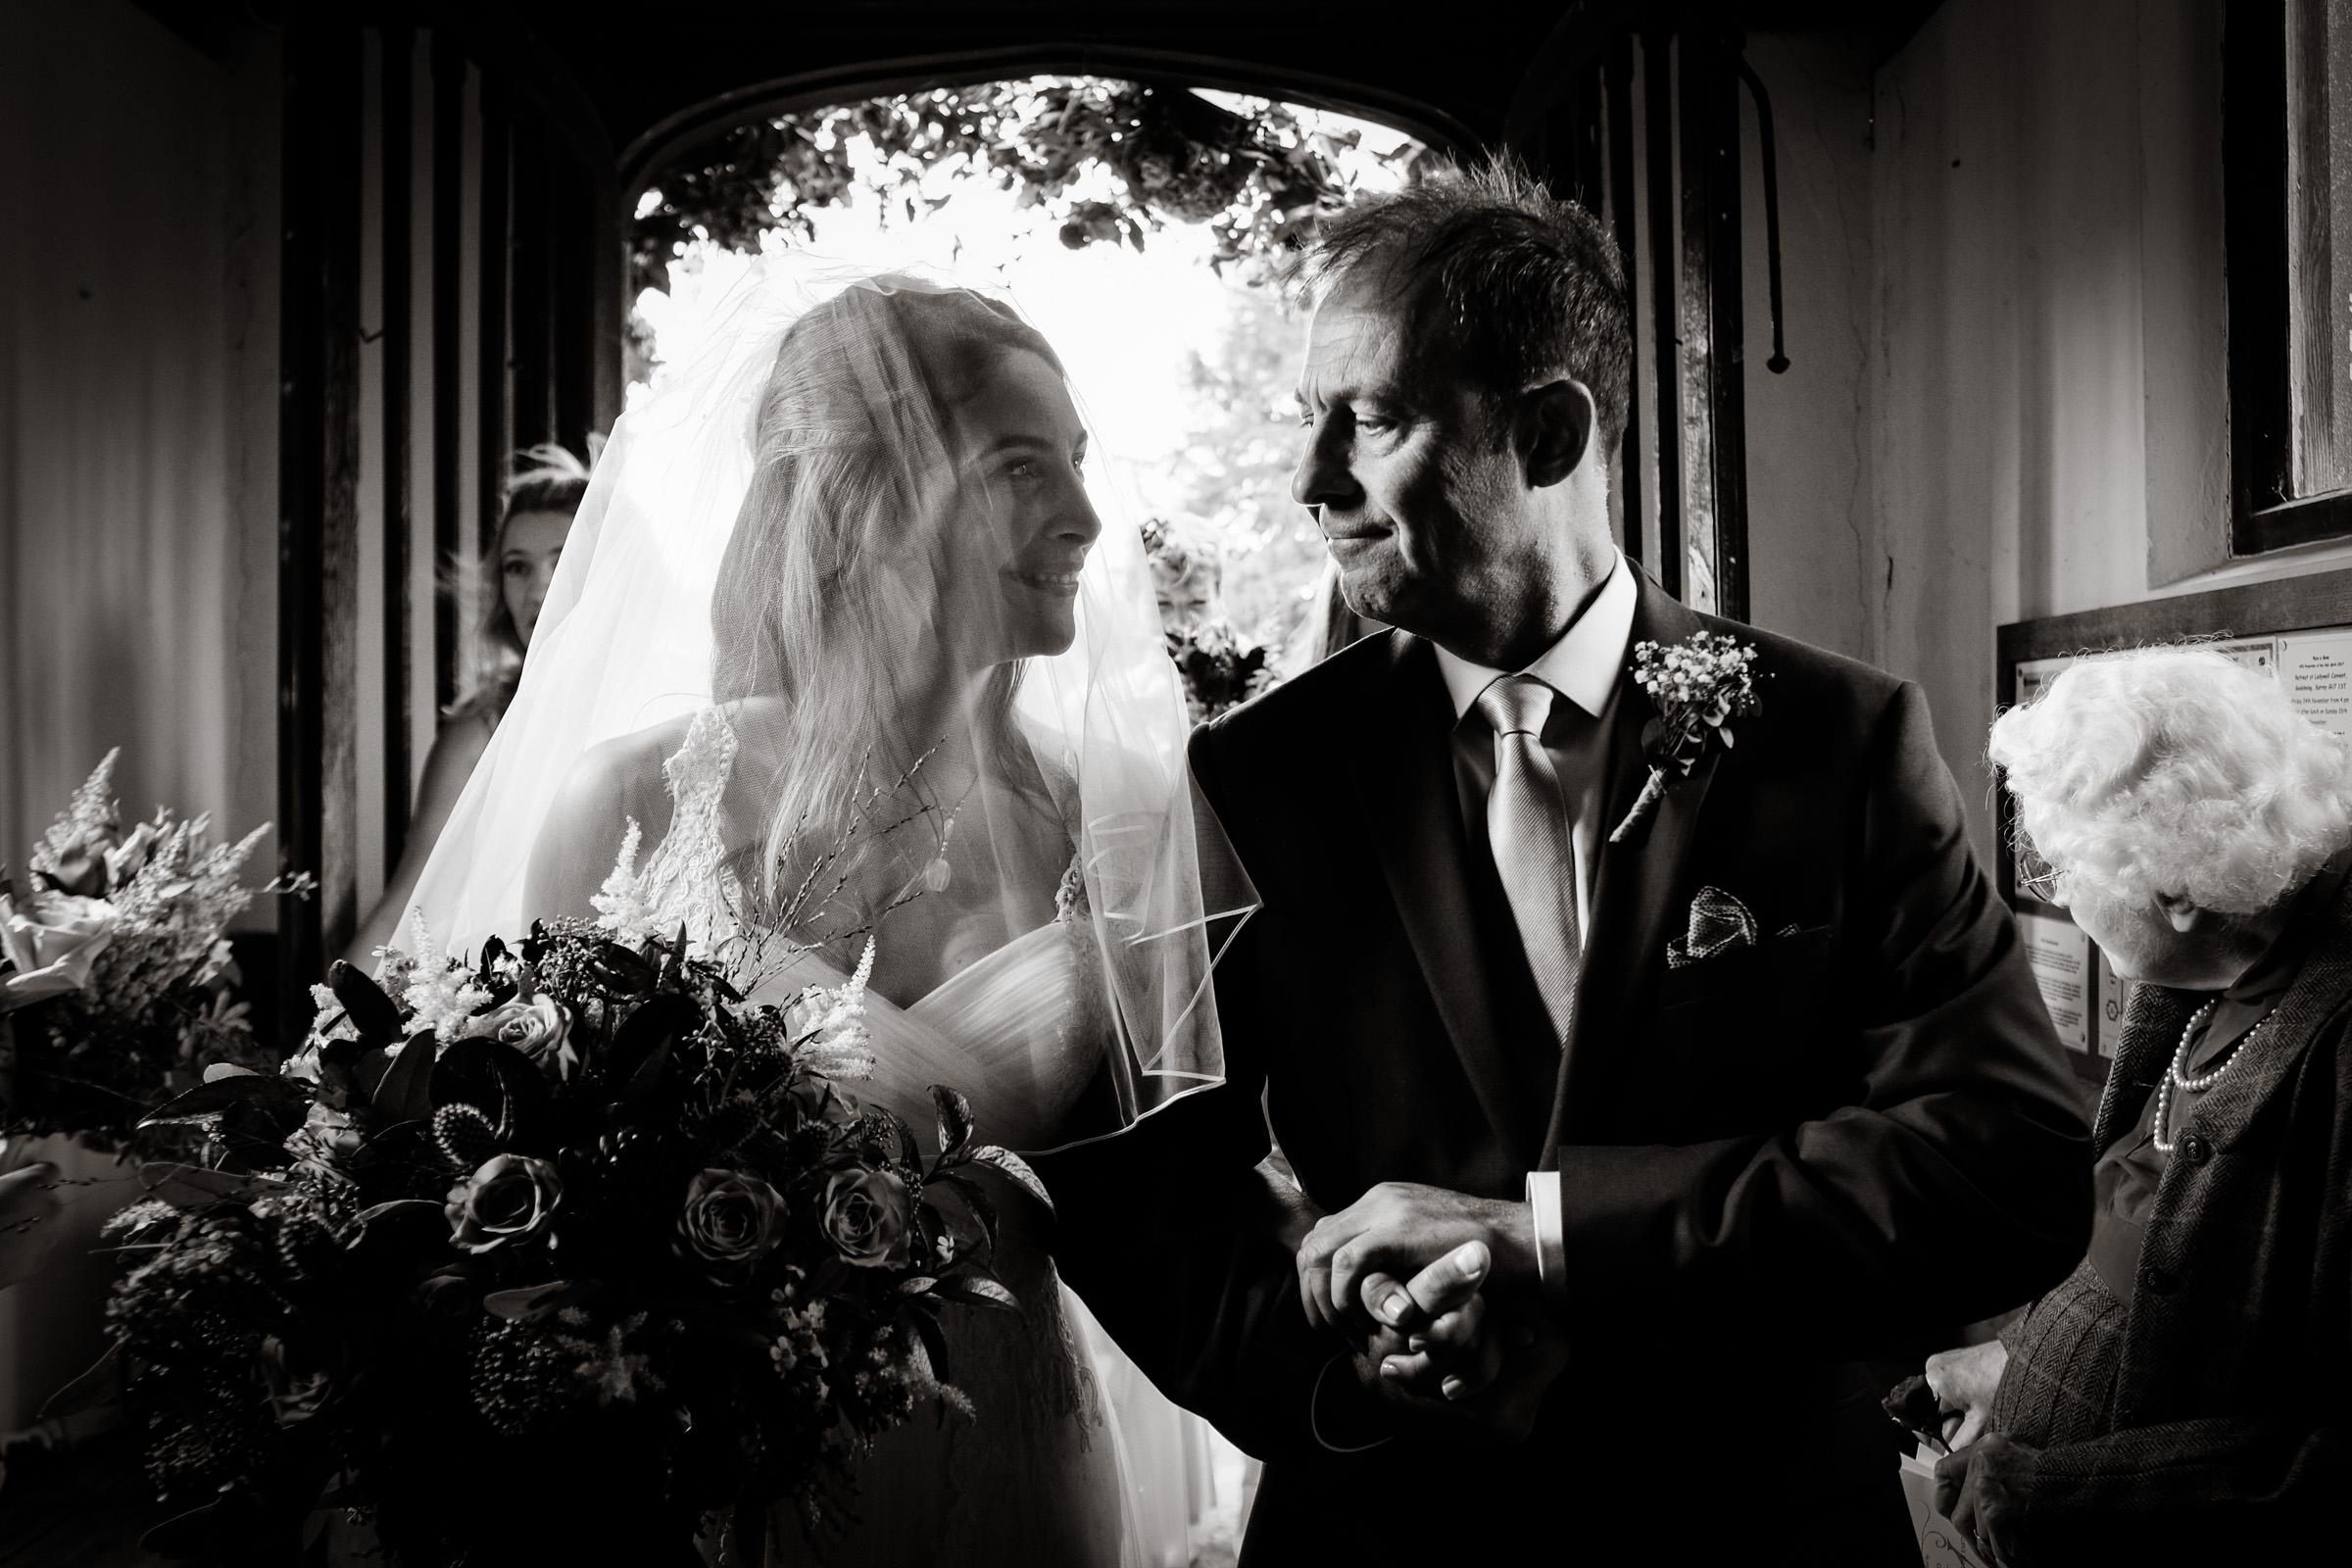 Talbot+Inn+Wedding+Photos+Surrey+009.jpg